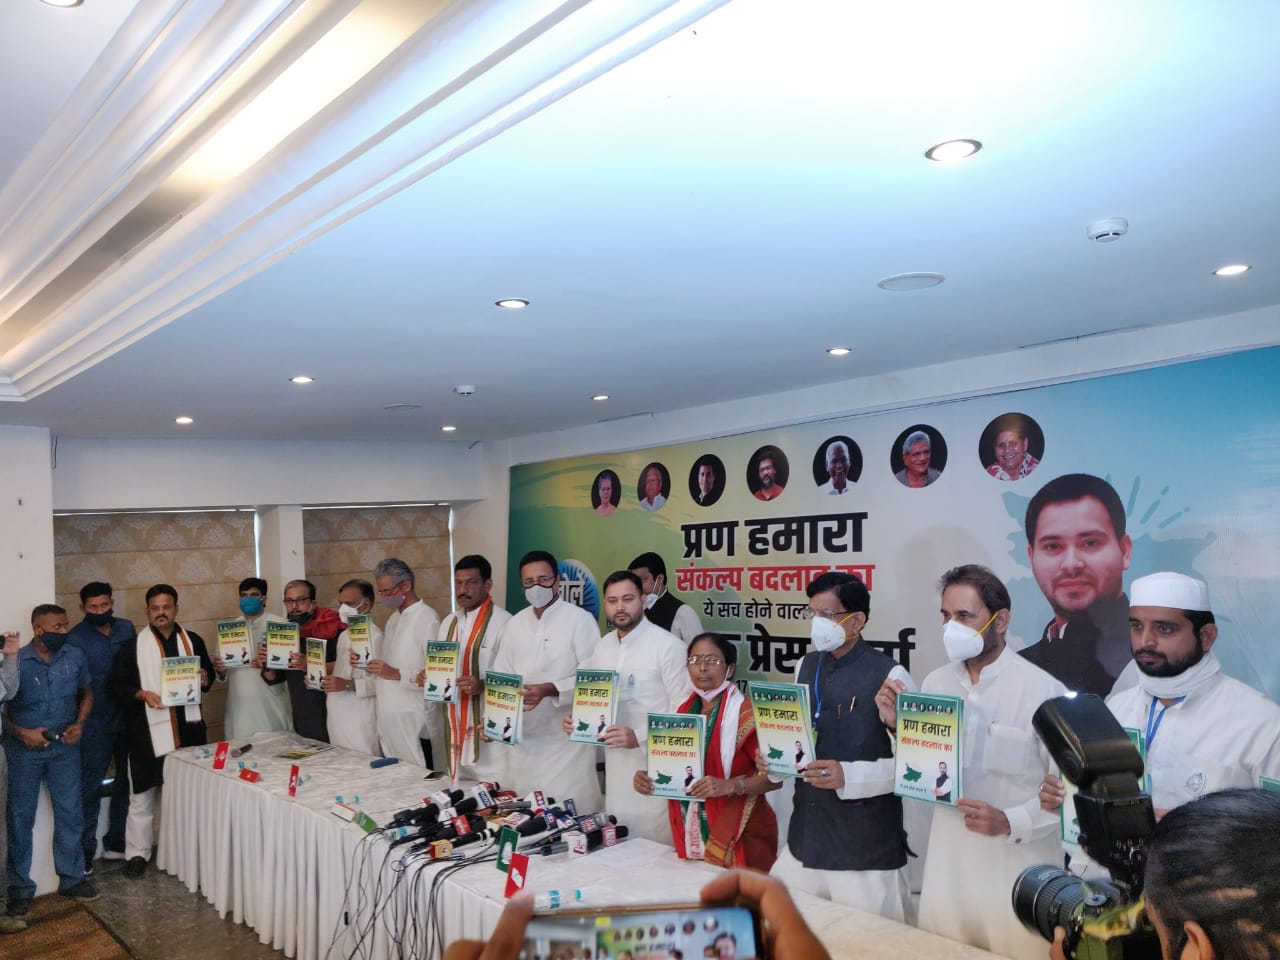 Randeep Singh Surjewala at the manifesto release